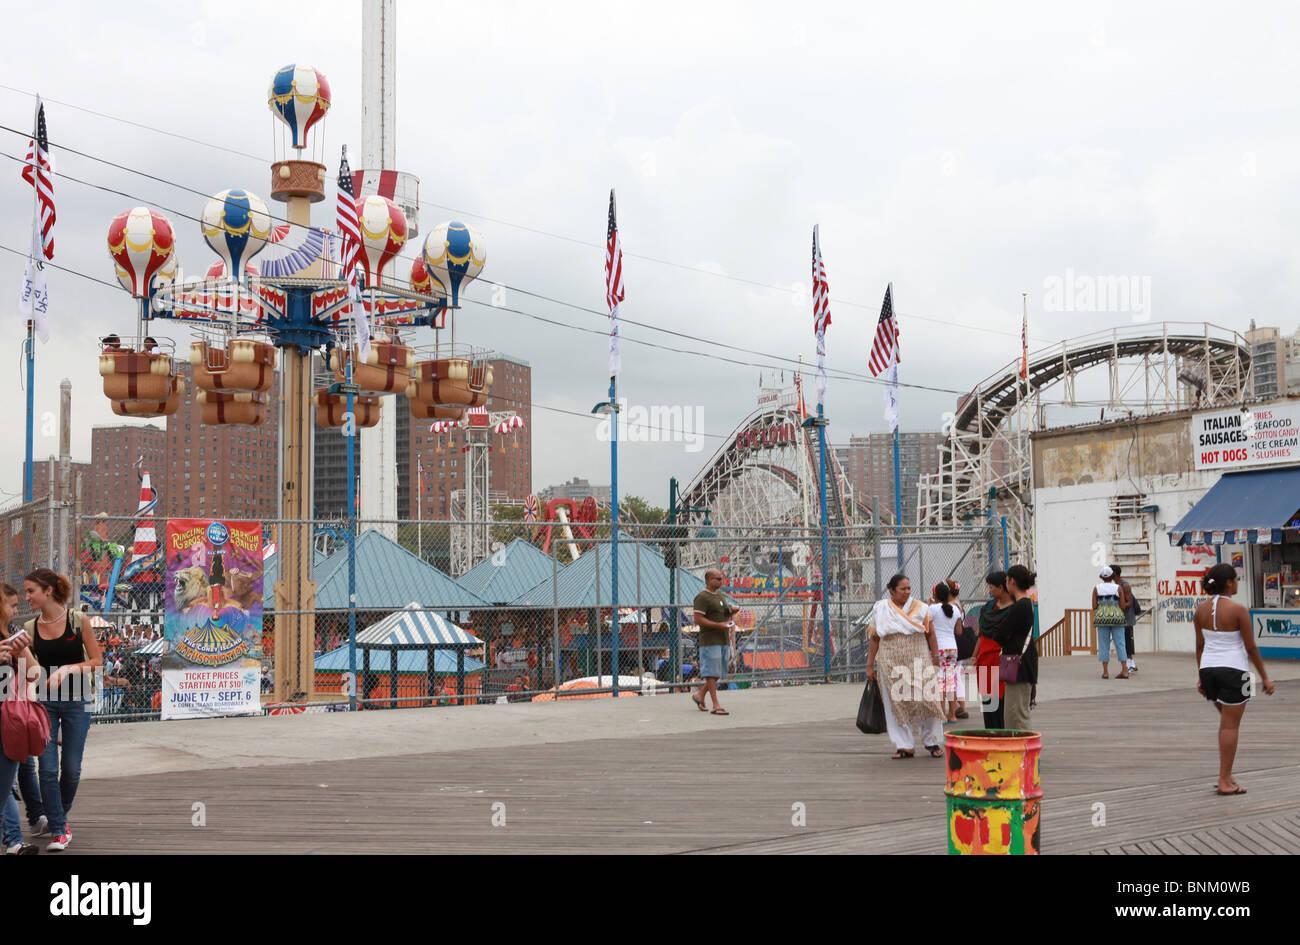 Balloon ride Coney Island - Stock Image